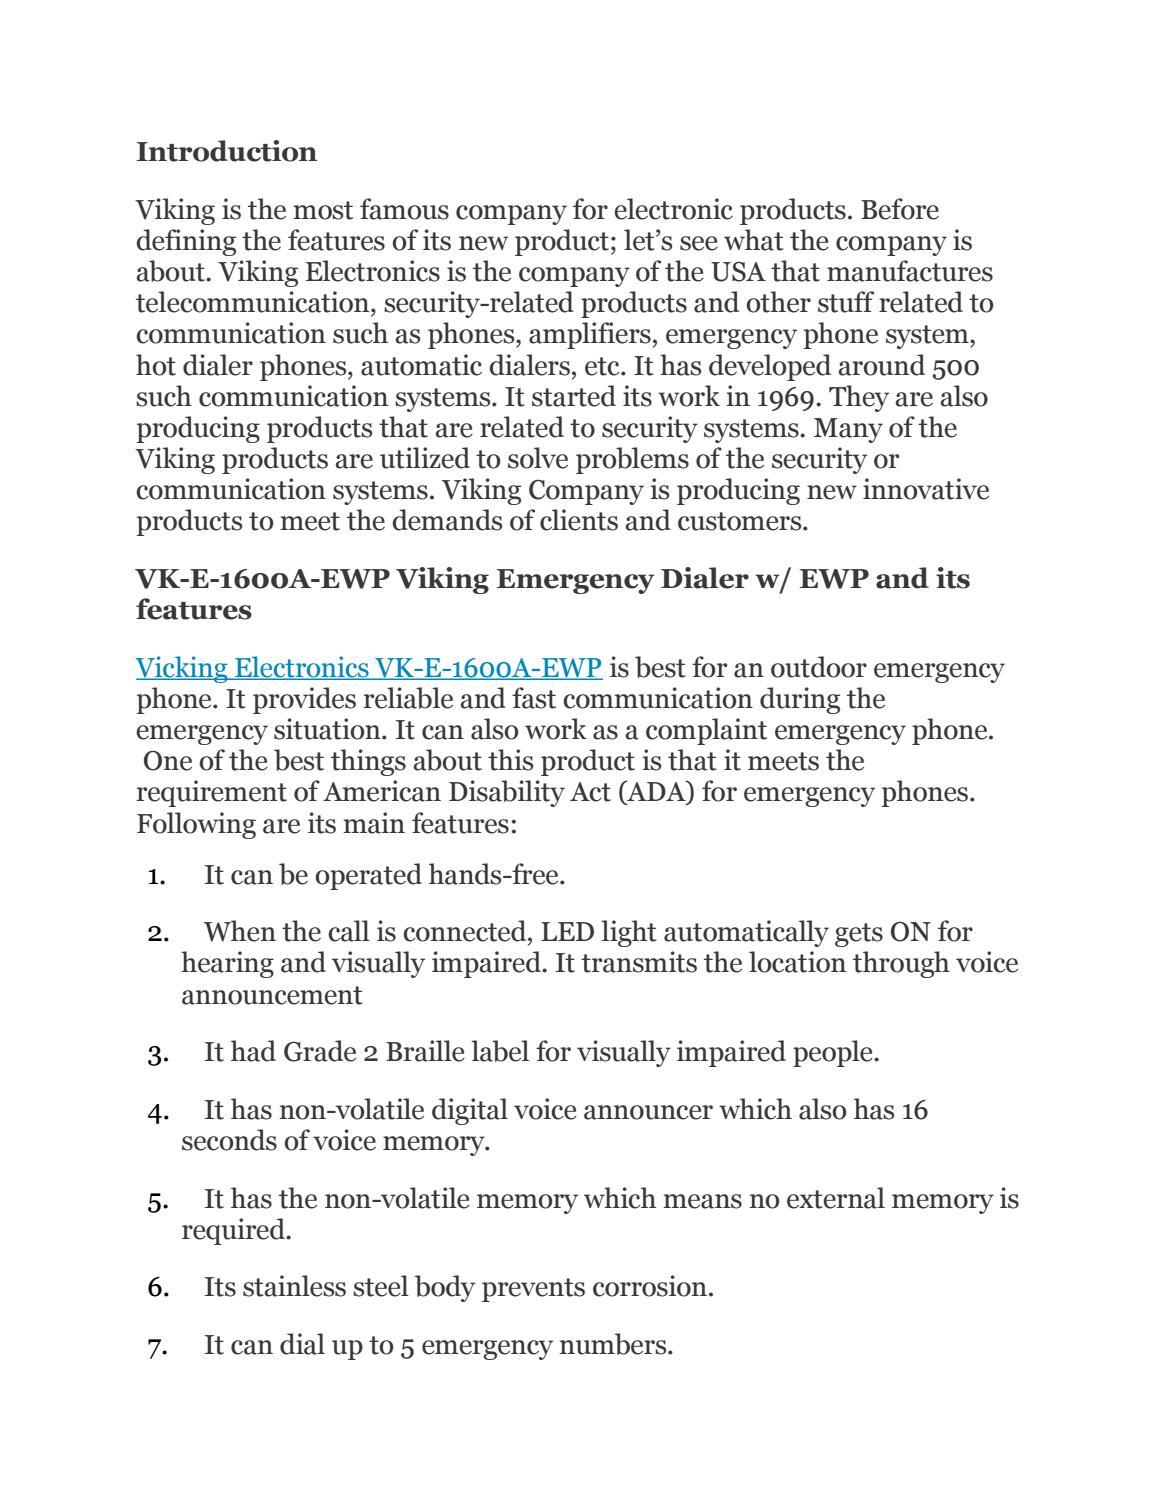 Vicking electronics vk e 1600a ewp by Go Headsets - issuu